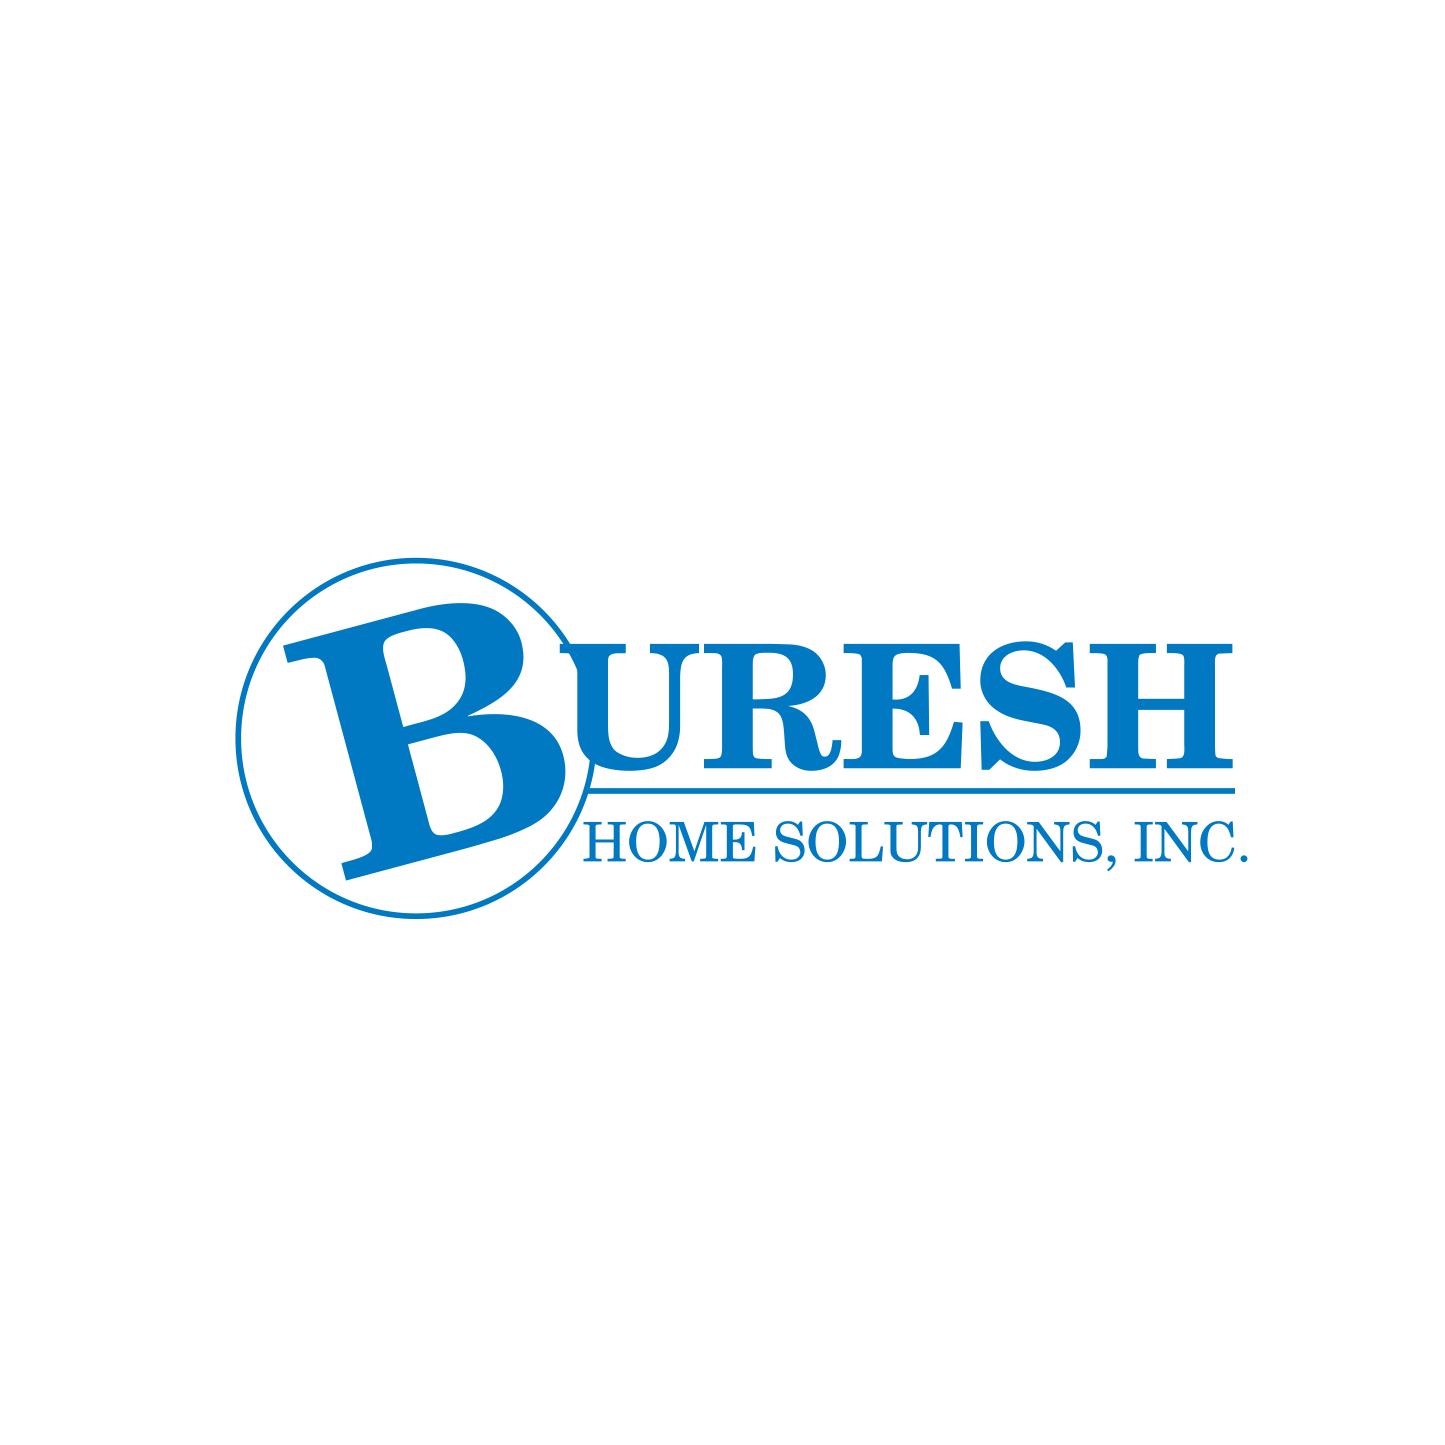 Buresh Home Solutions, Inc.